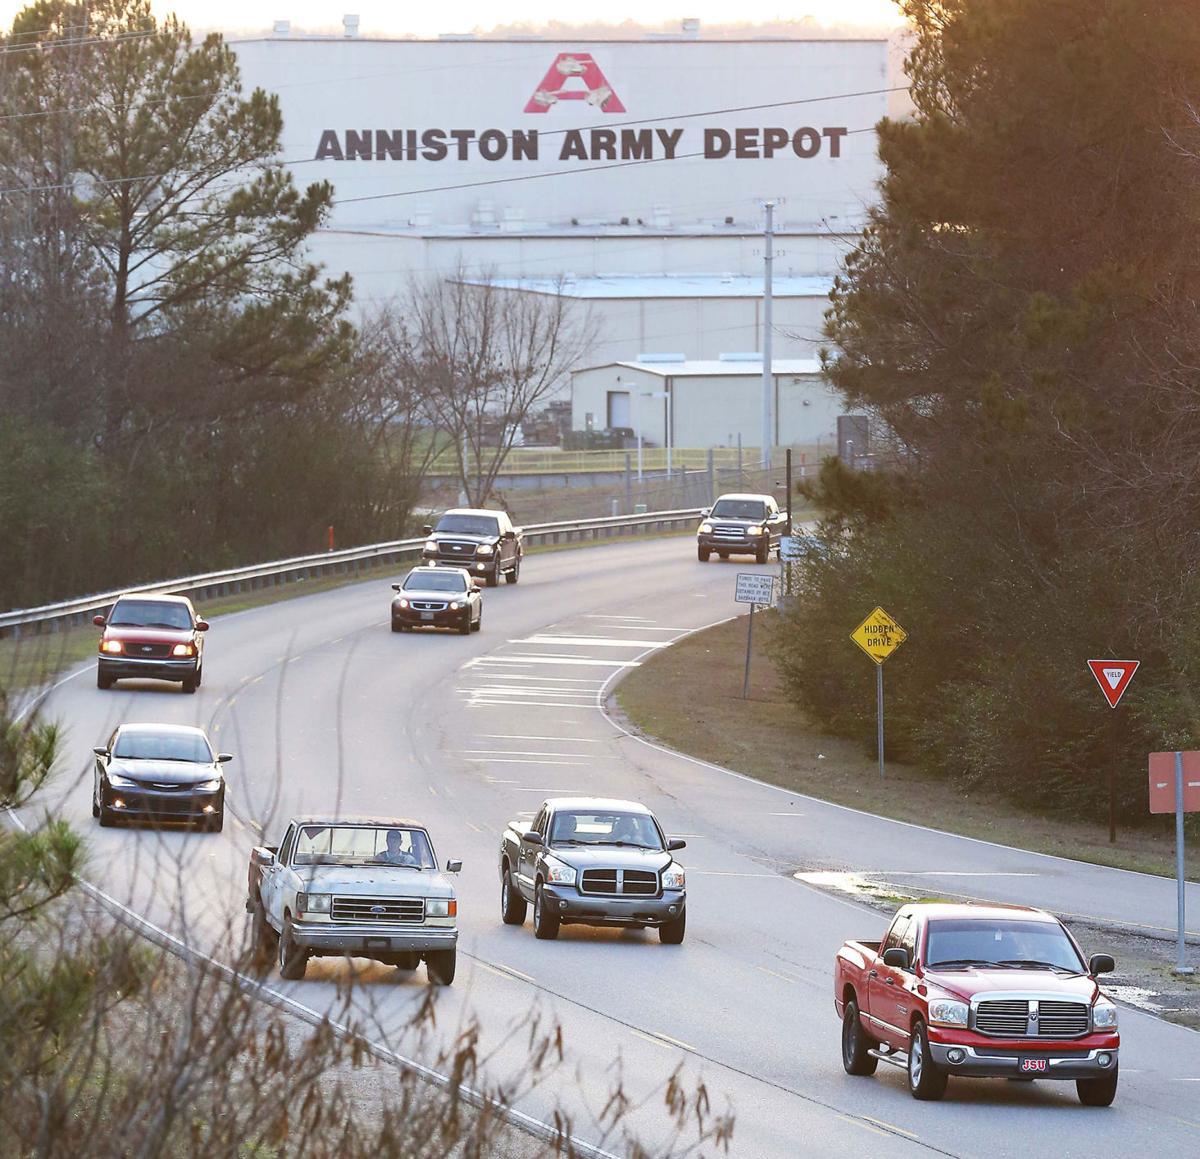 Anniston Army Depot traffic